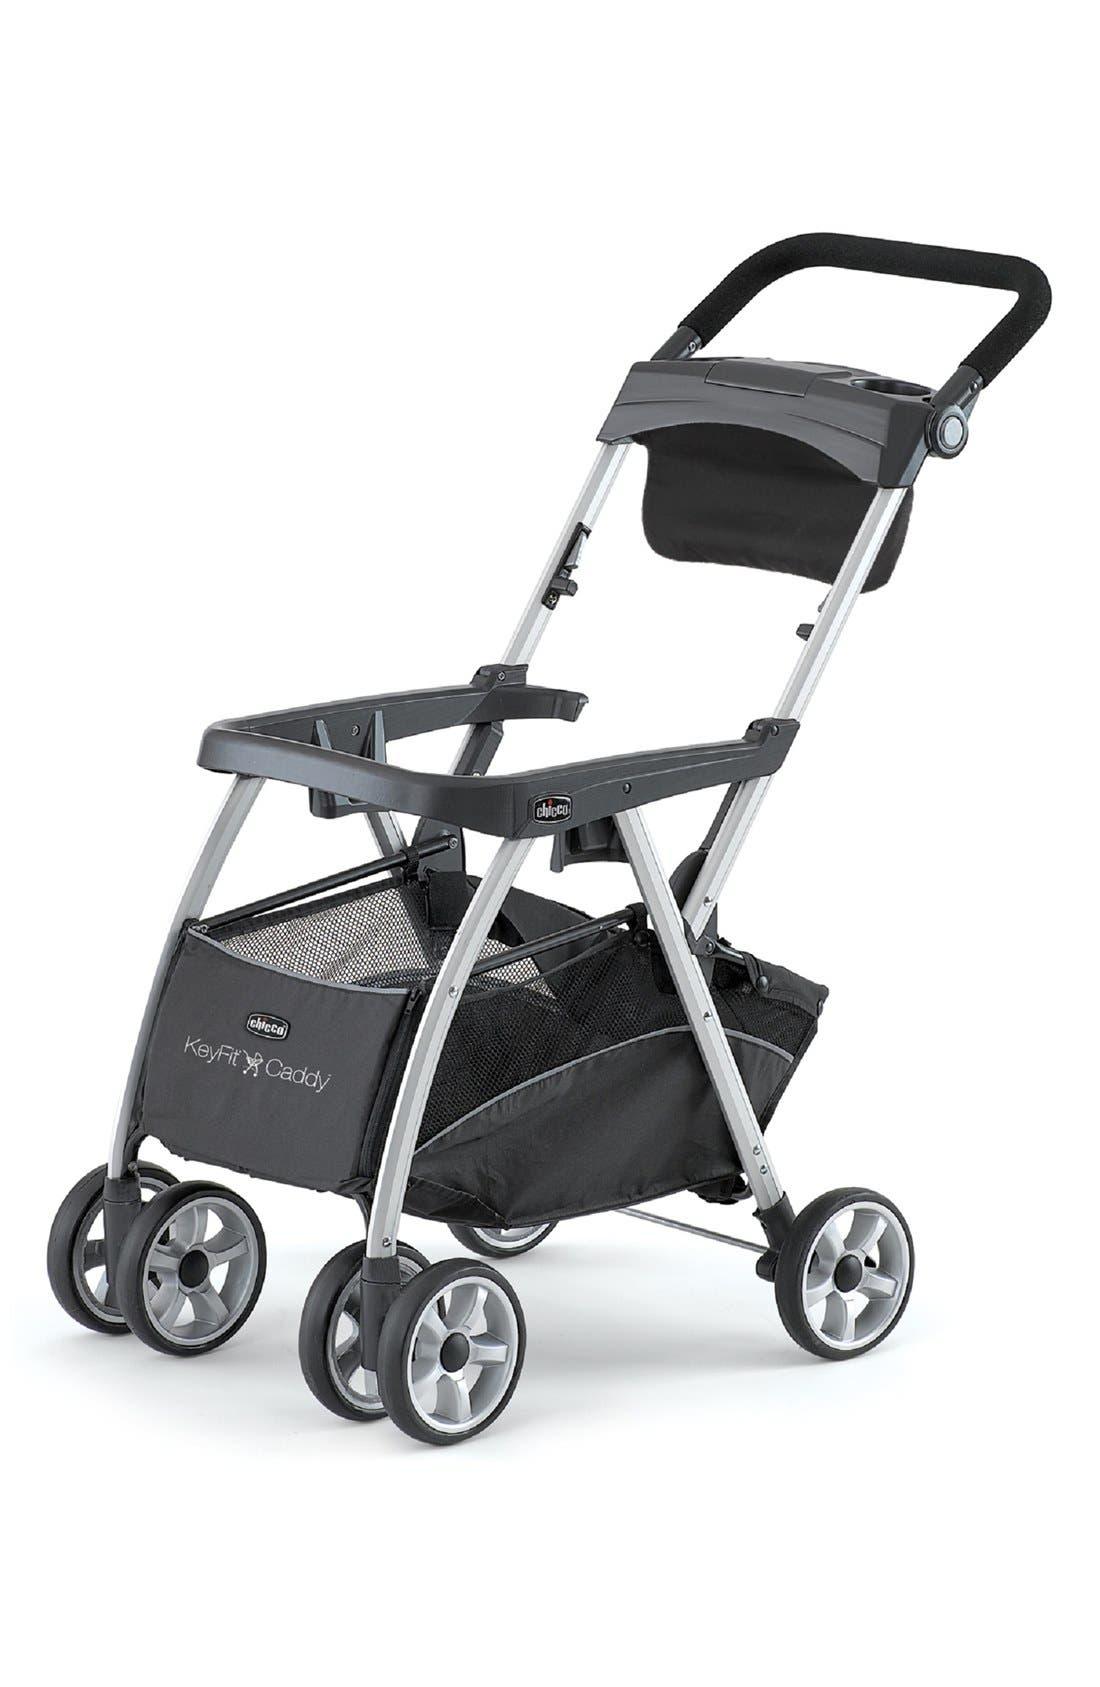 KeyFit<sup>®</sup> Caddy<sup>™</sup> Frame Stroller,                         Main,                         color, Black